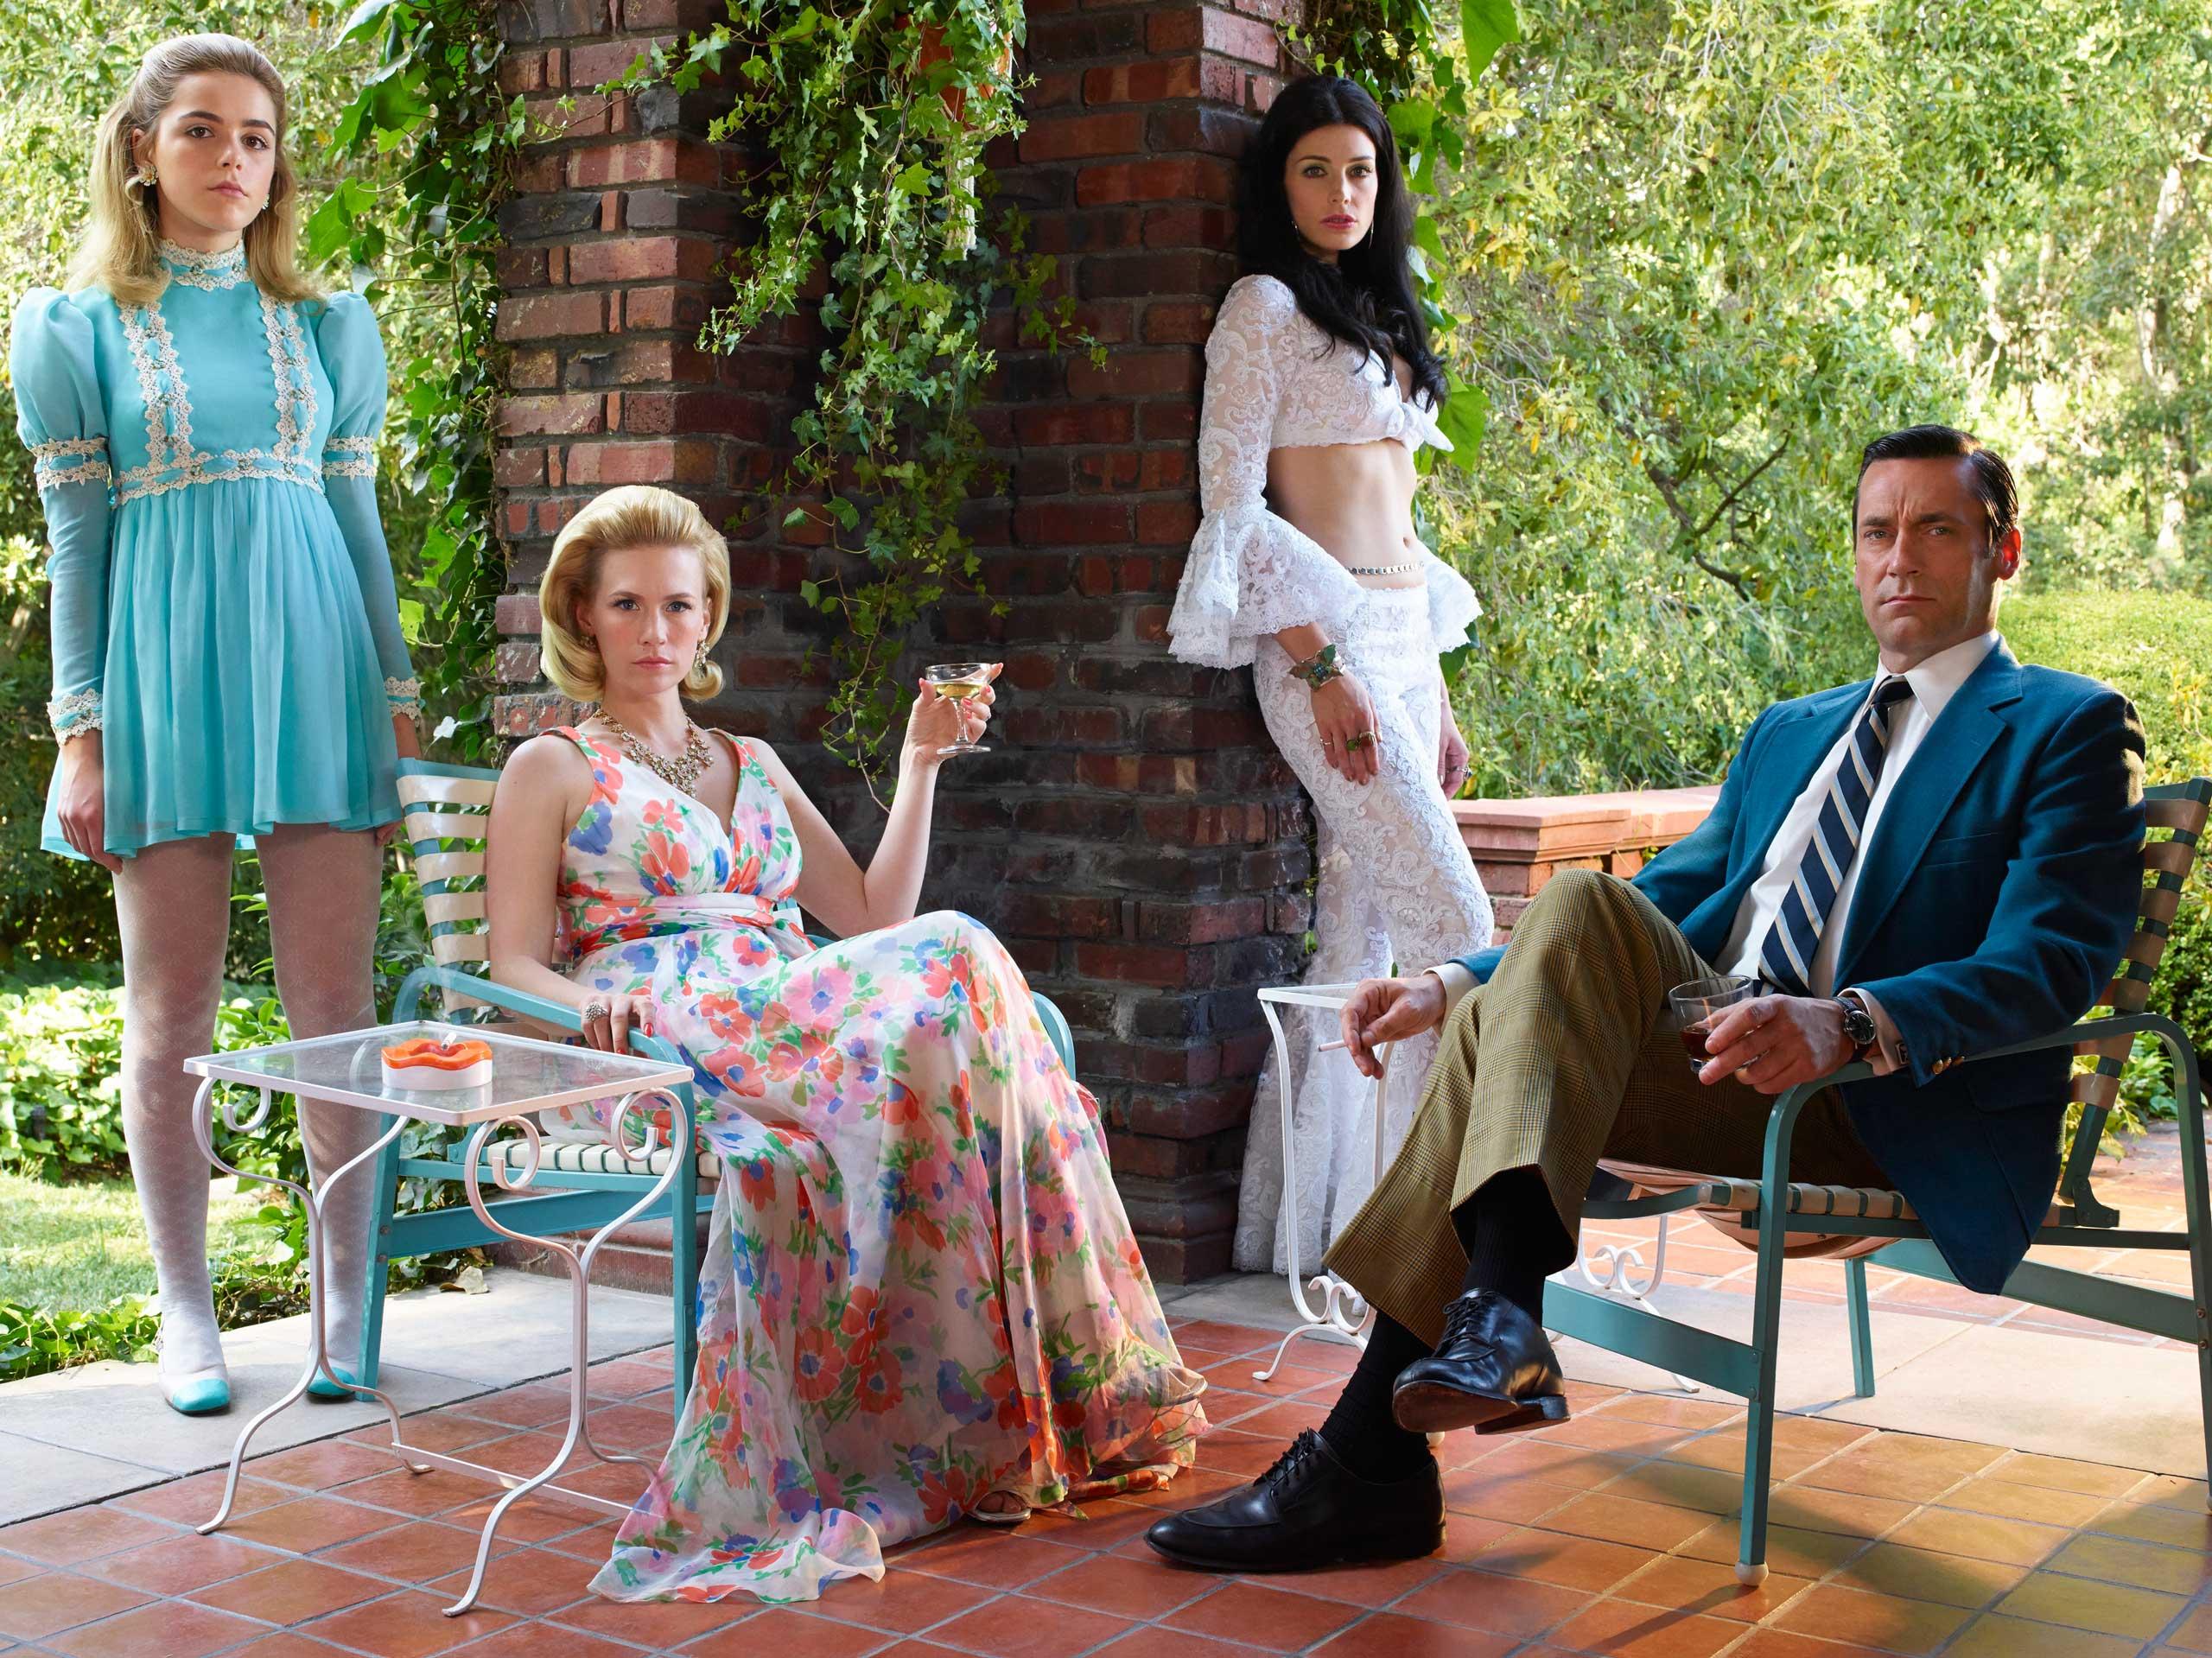 From Left: Kiernan Shipka as Sally Draper, January Jones as Betty Francis, Jessica Pare as Megan Draper and Jon Hamm as Don Draper in Mad Men season 7B.